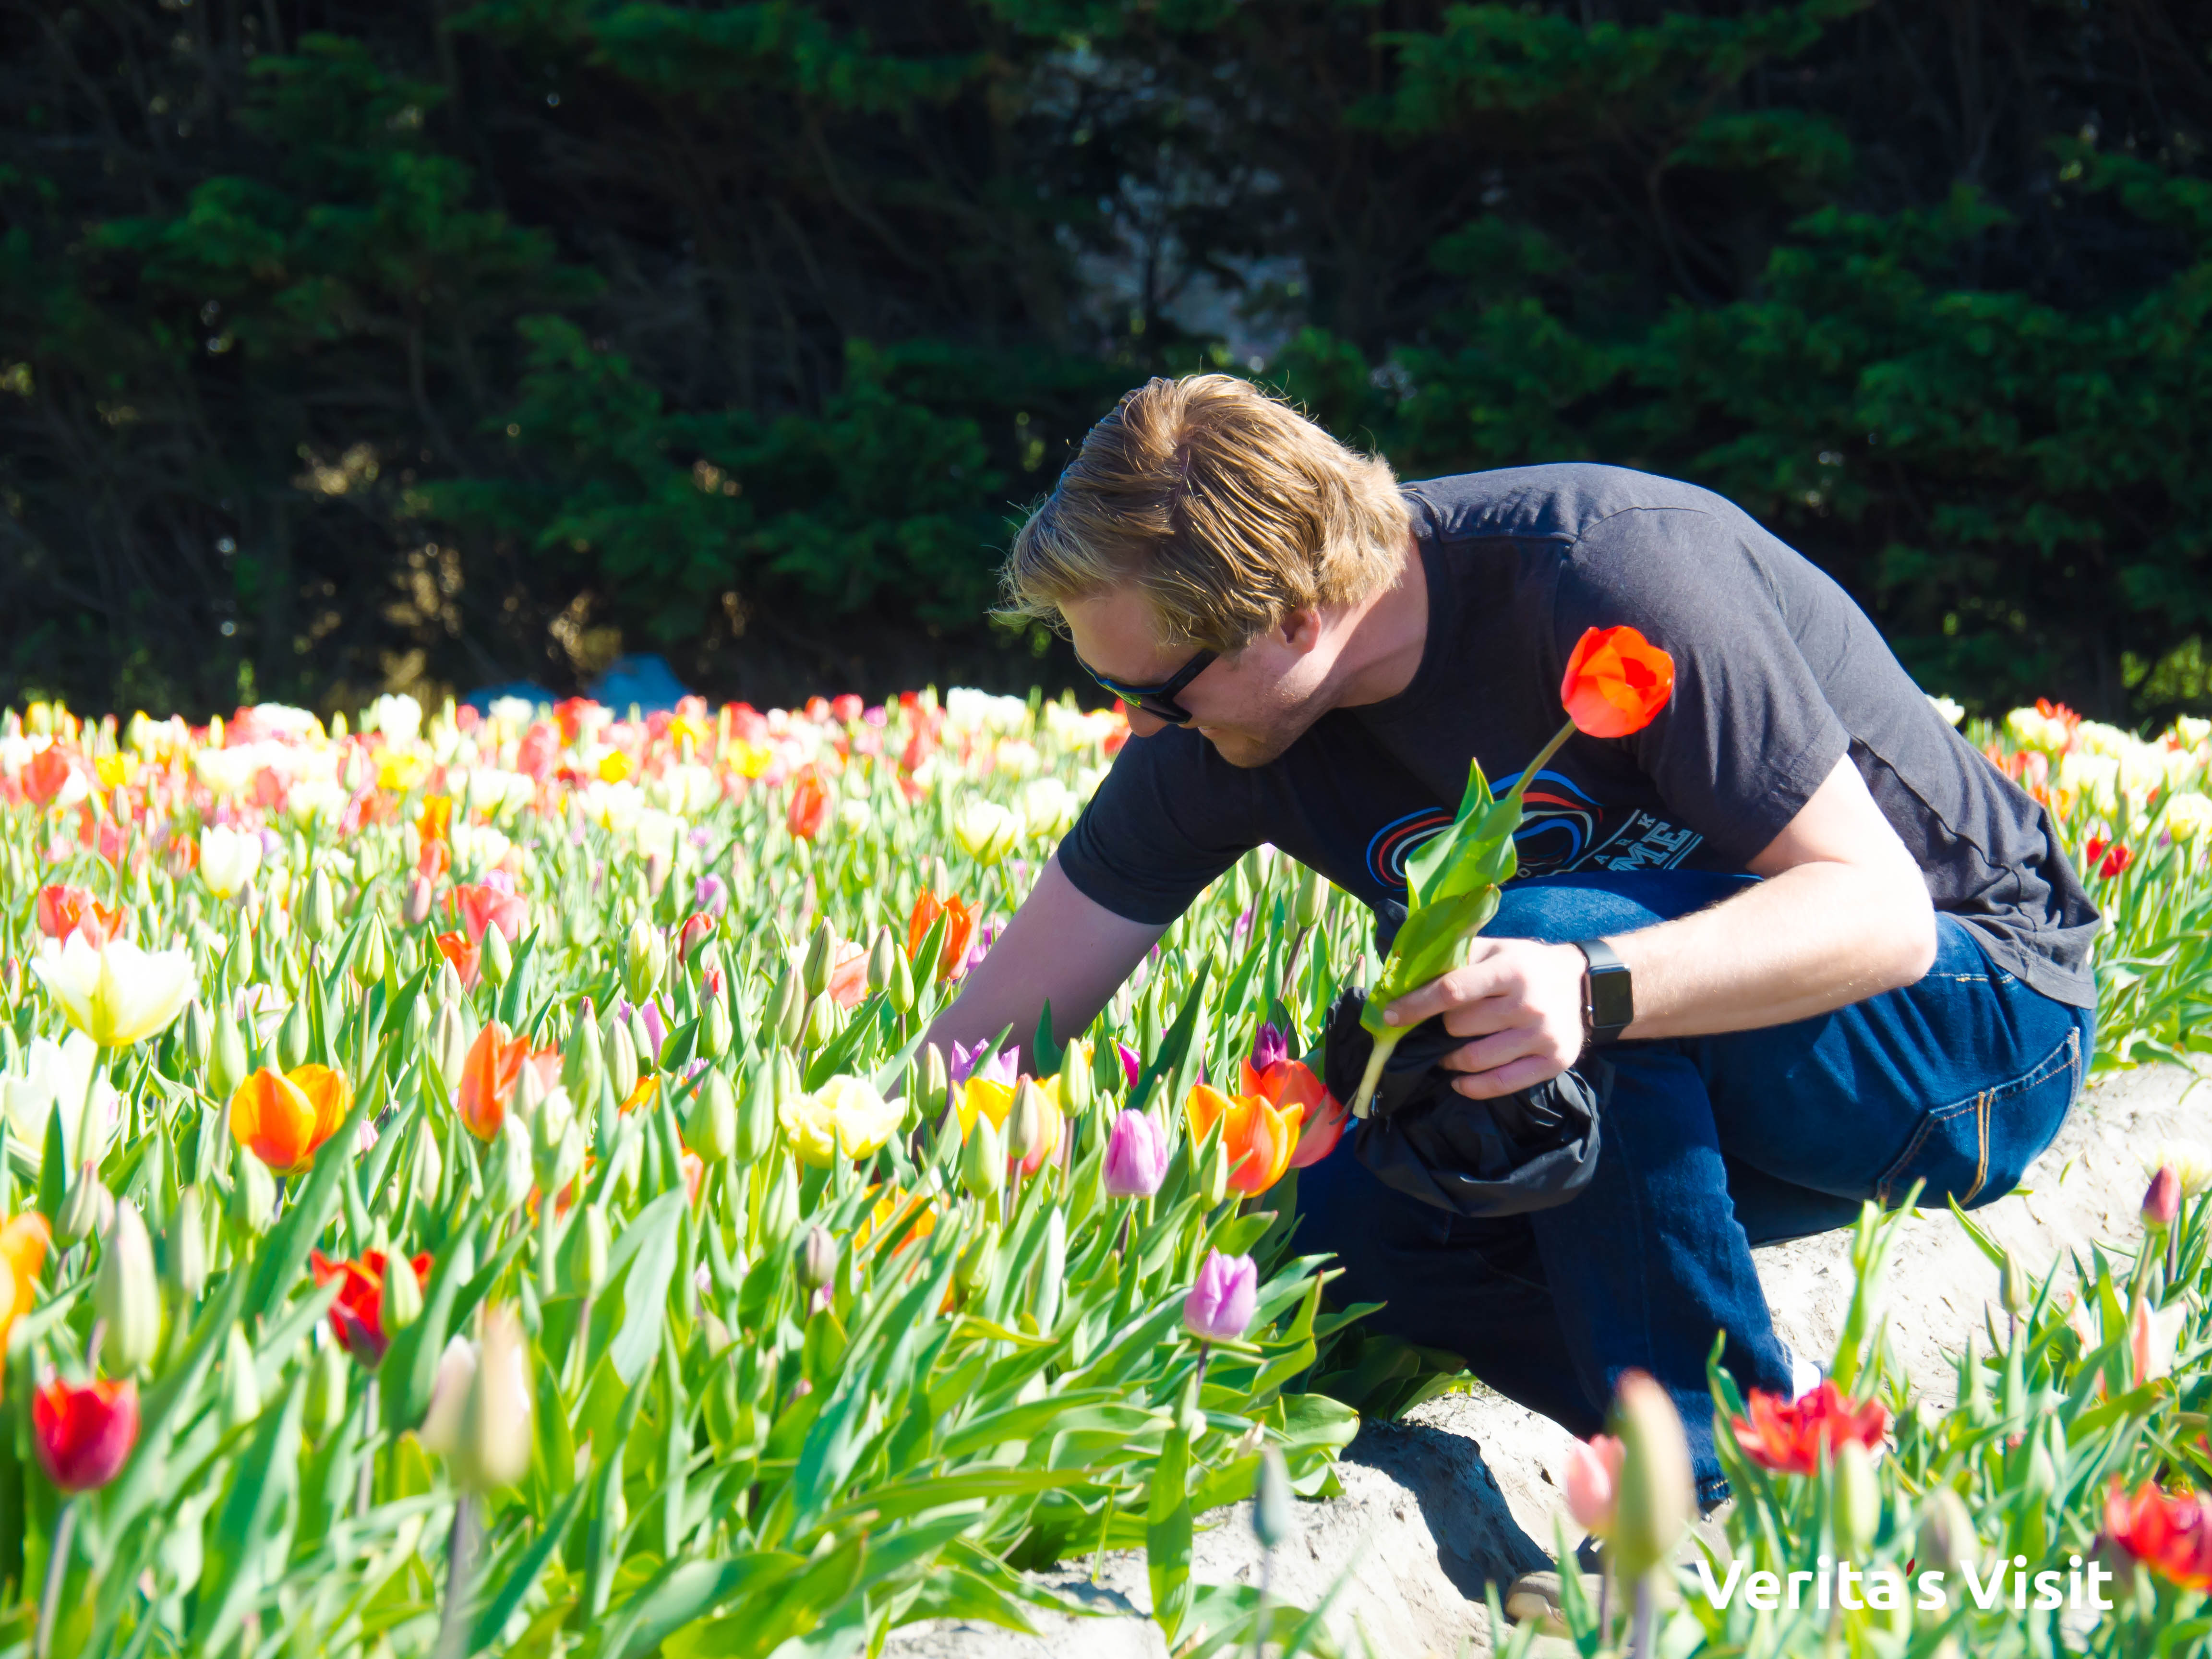 Tulip picking tour Verita's Visit tulpen plukken fietstocht